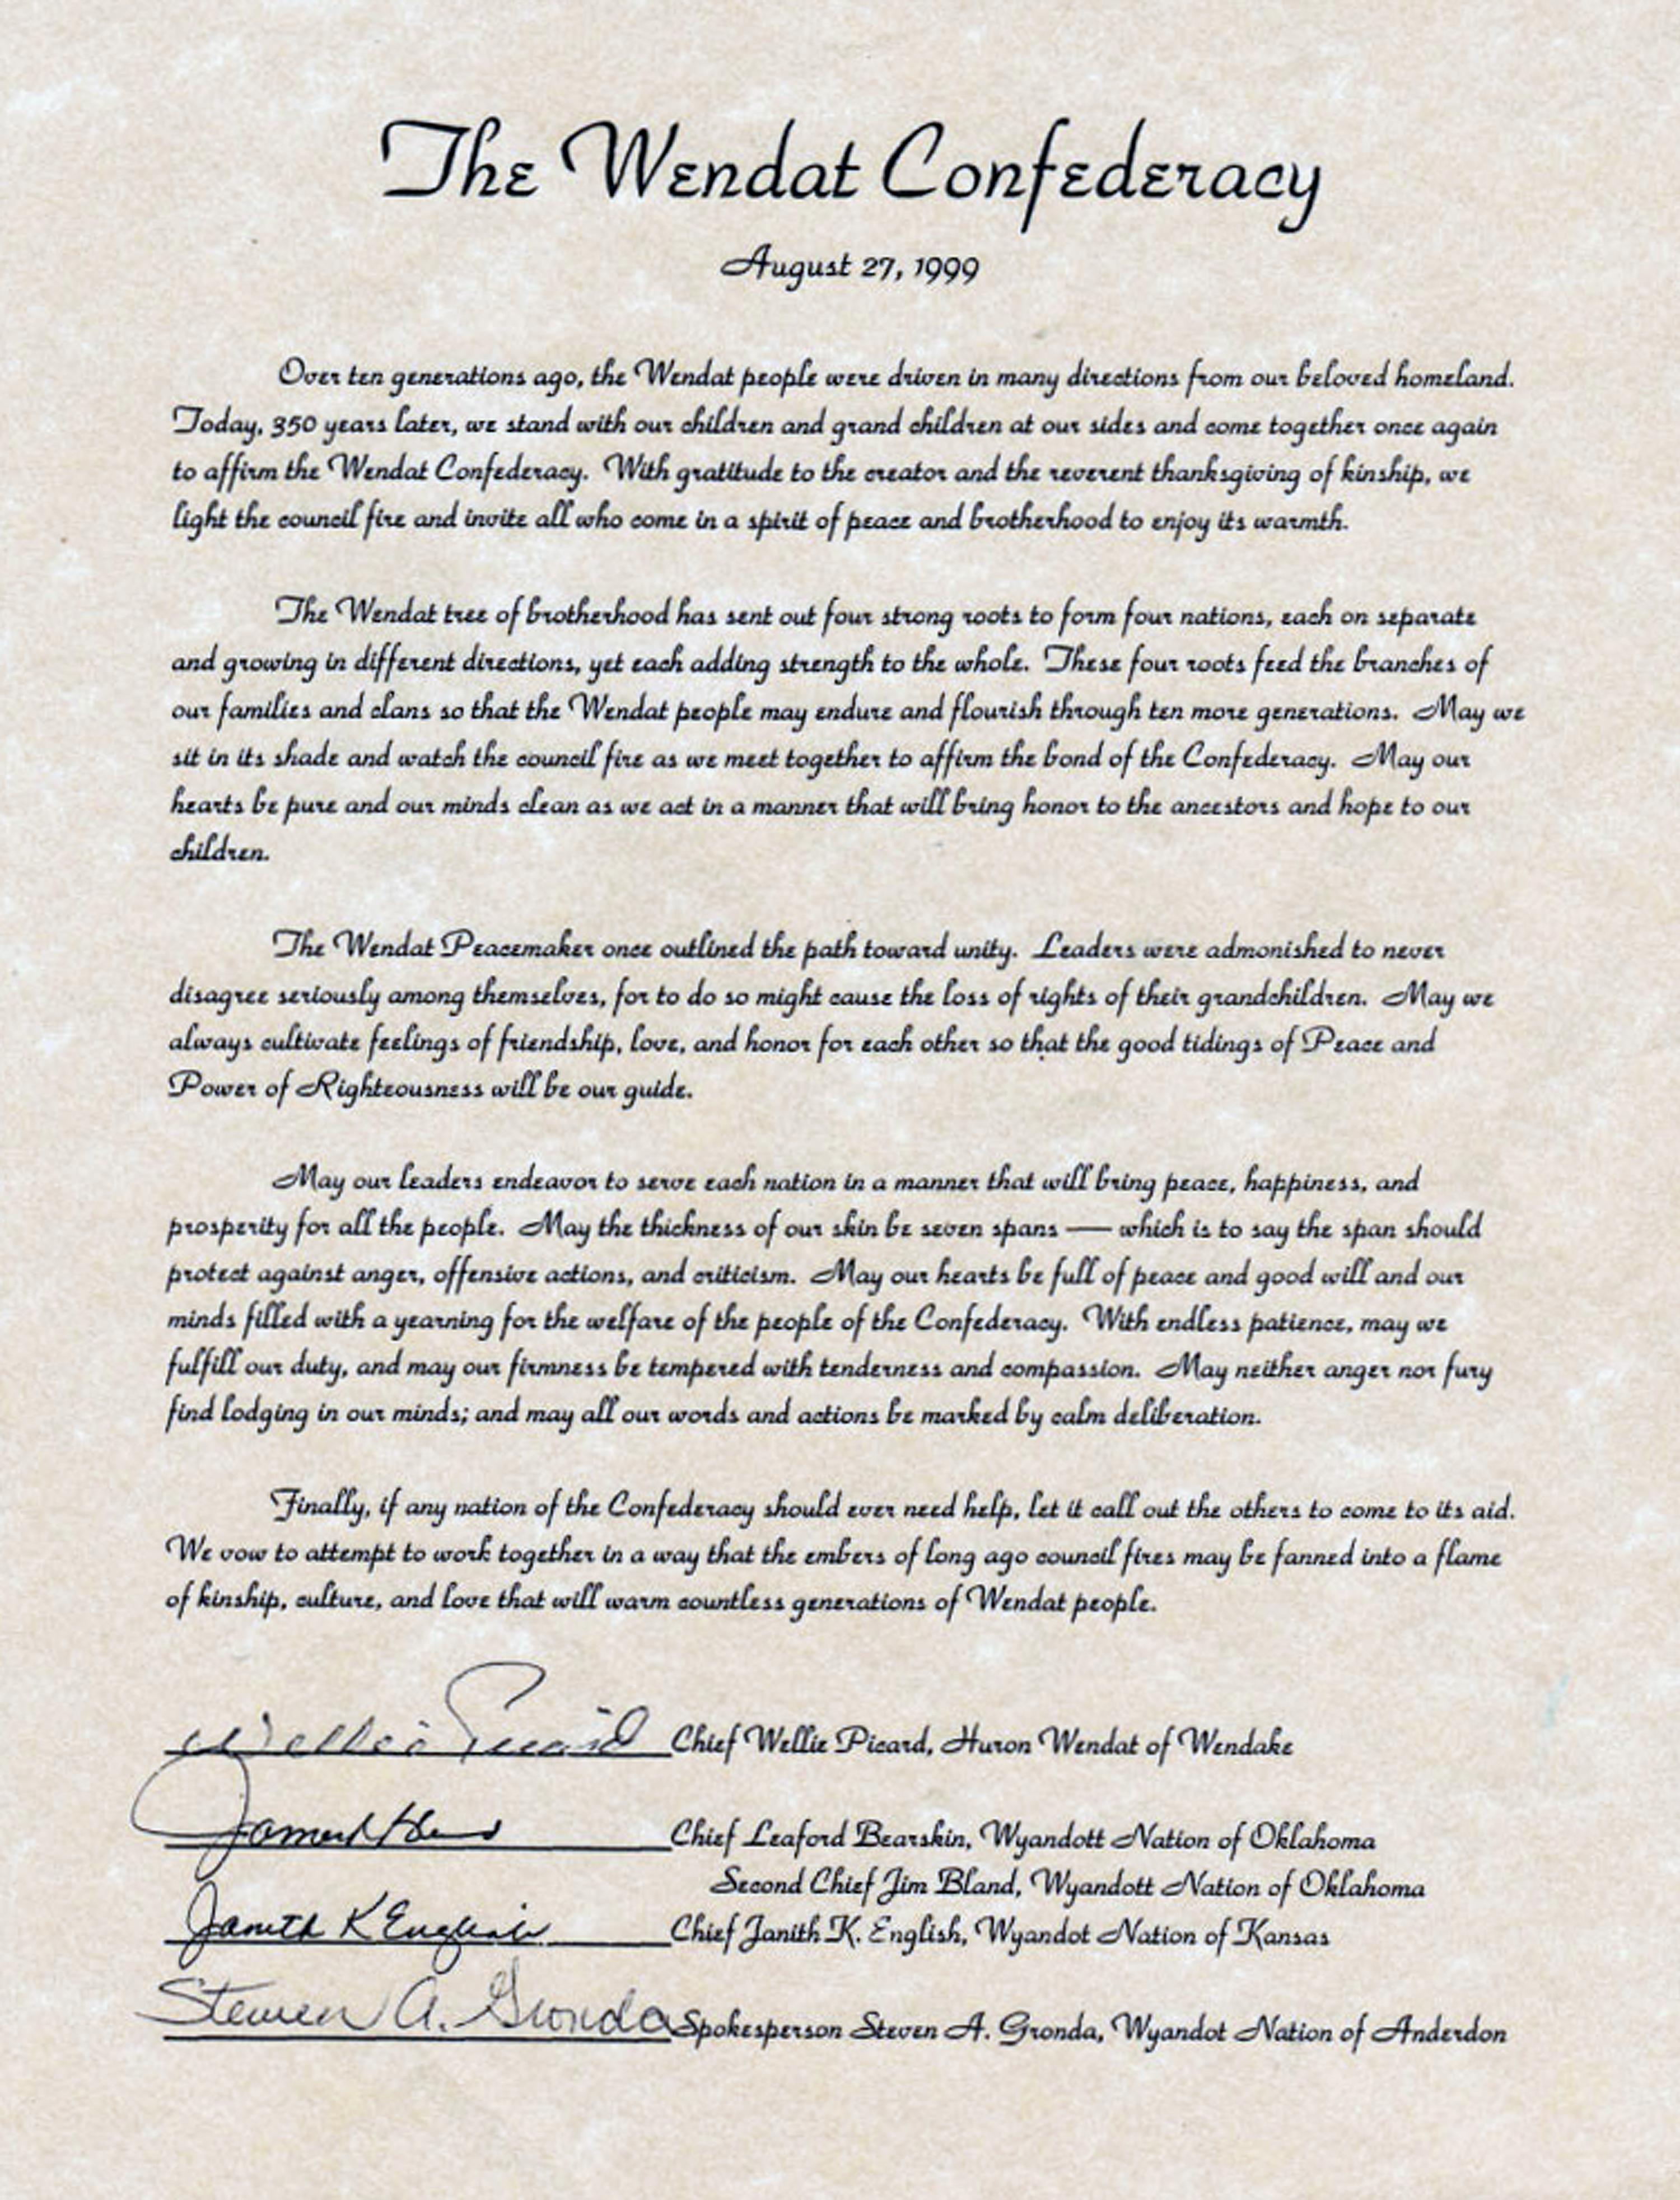 1999ConfederacyAgreement